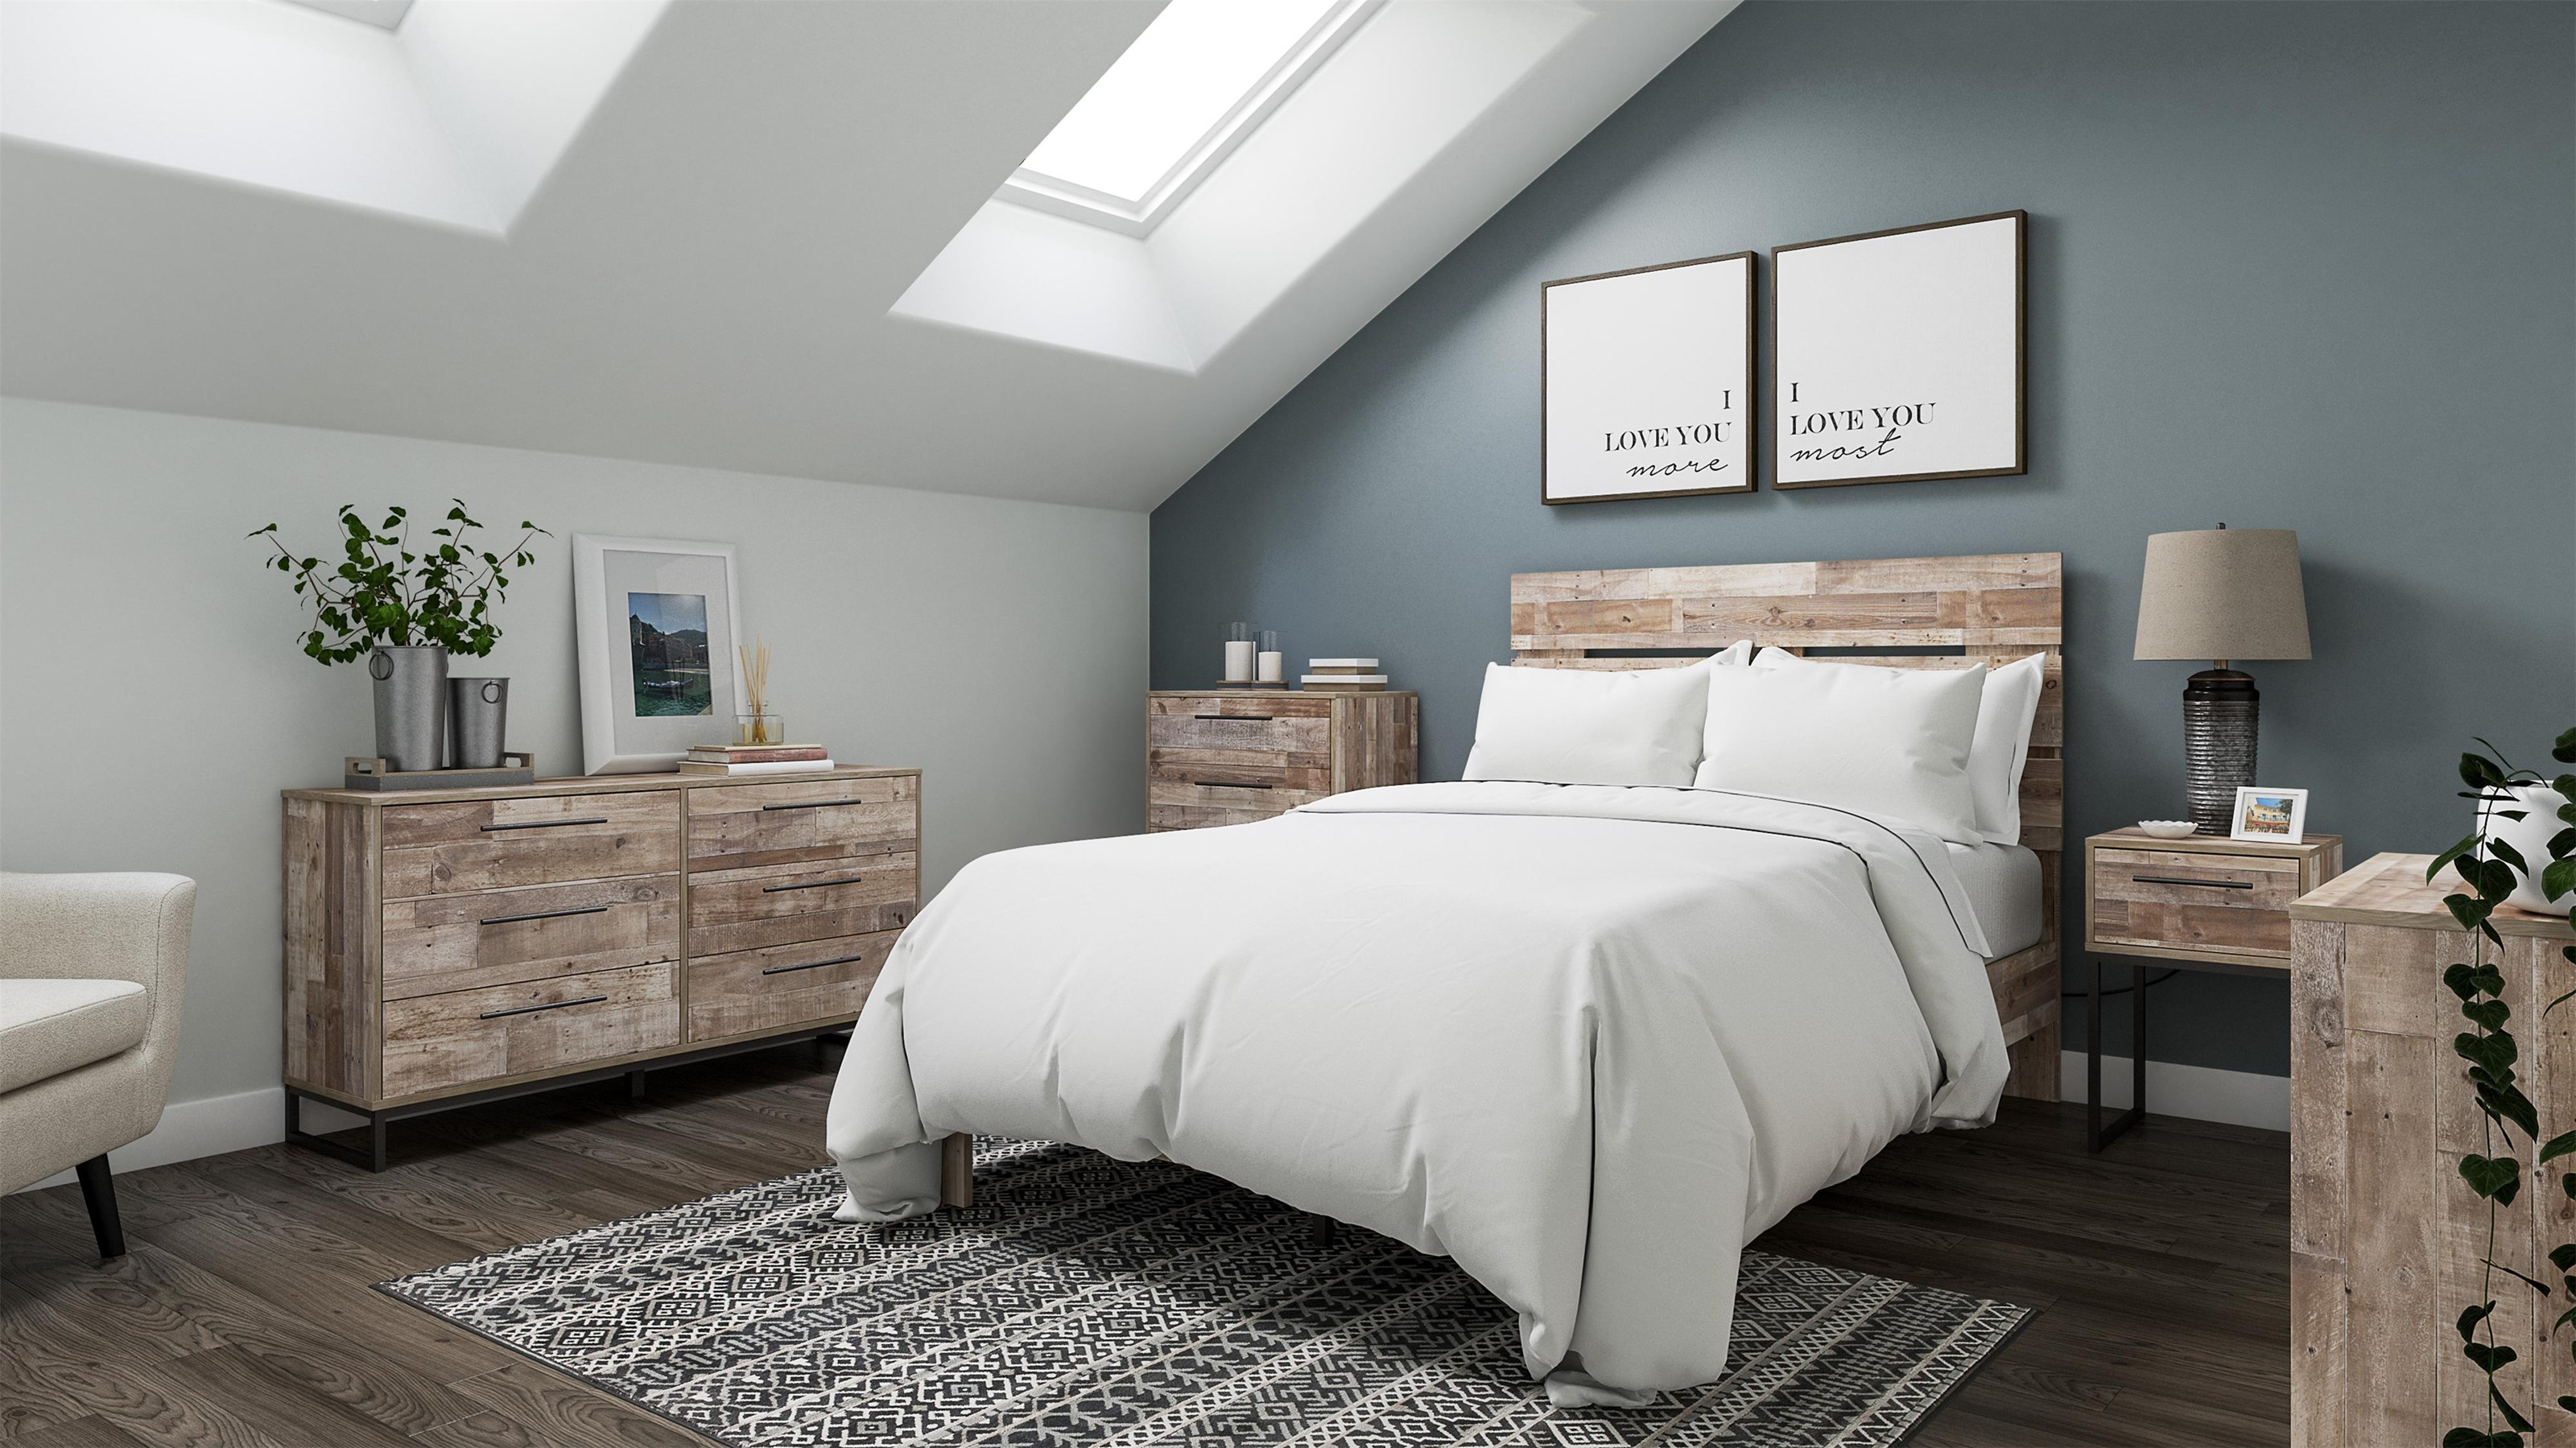 Neilsville 3 Piece Queen Bedroom Set by Signature Design by Ashley at Sam Levitz Furniture